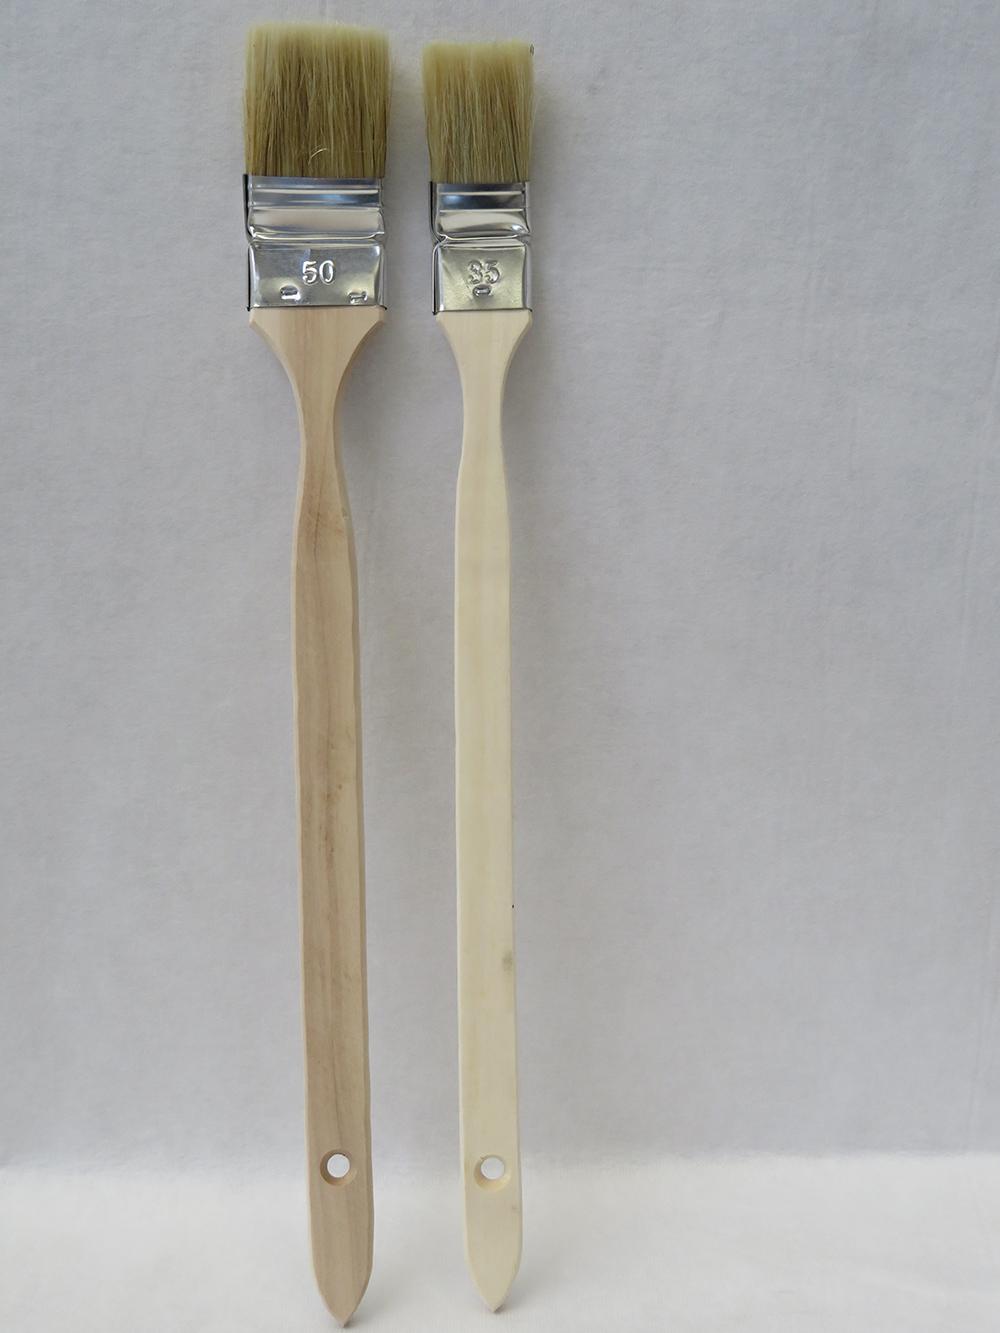 Pinsel Heizkörper lang Breite 50mm